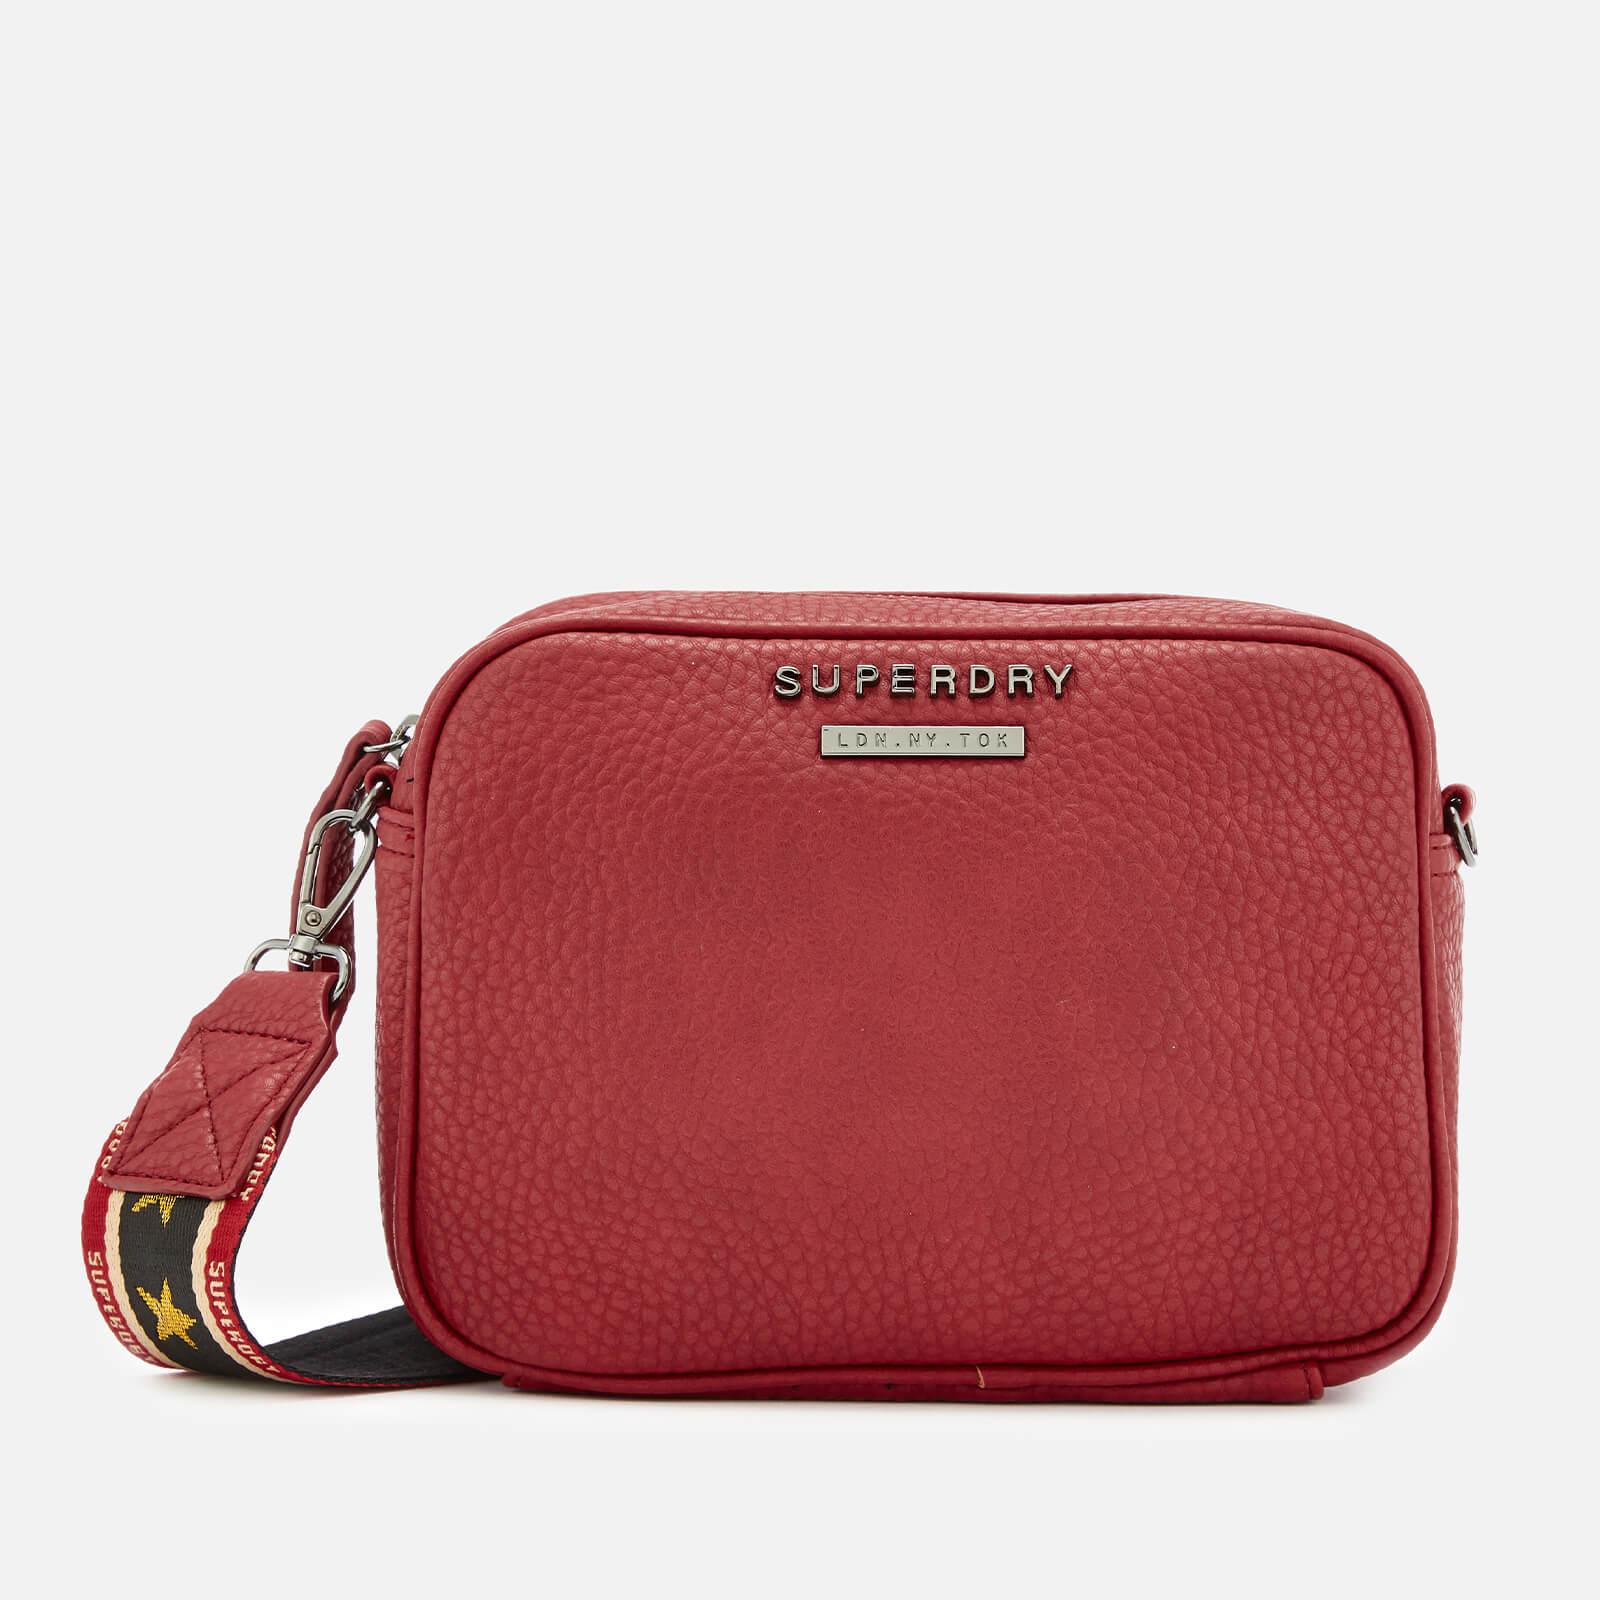 8b007fec583 Superdry Women's Delwen Strap Cross Body Bag - Red Womens Accessories |  TheHut.com